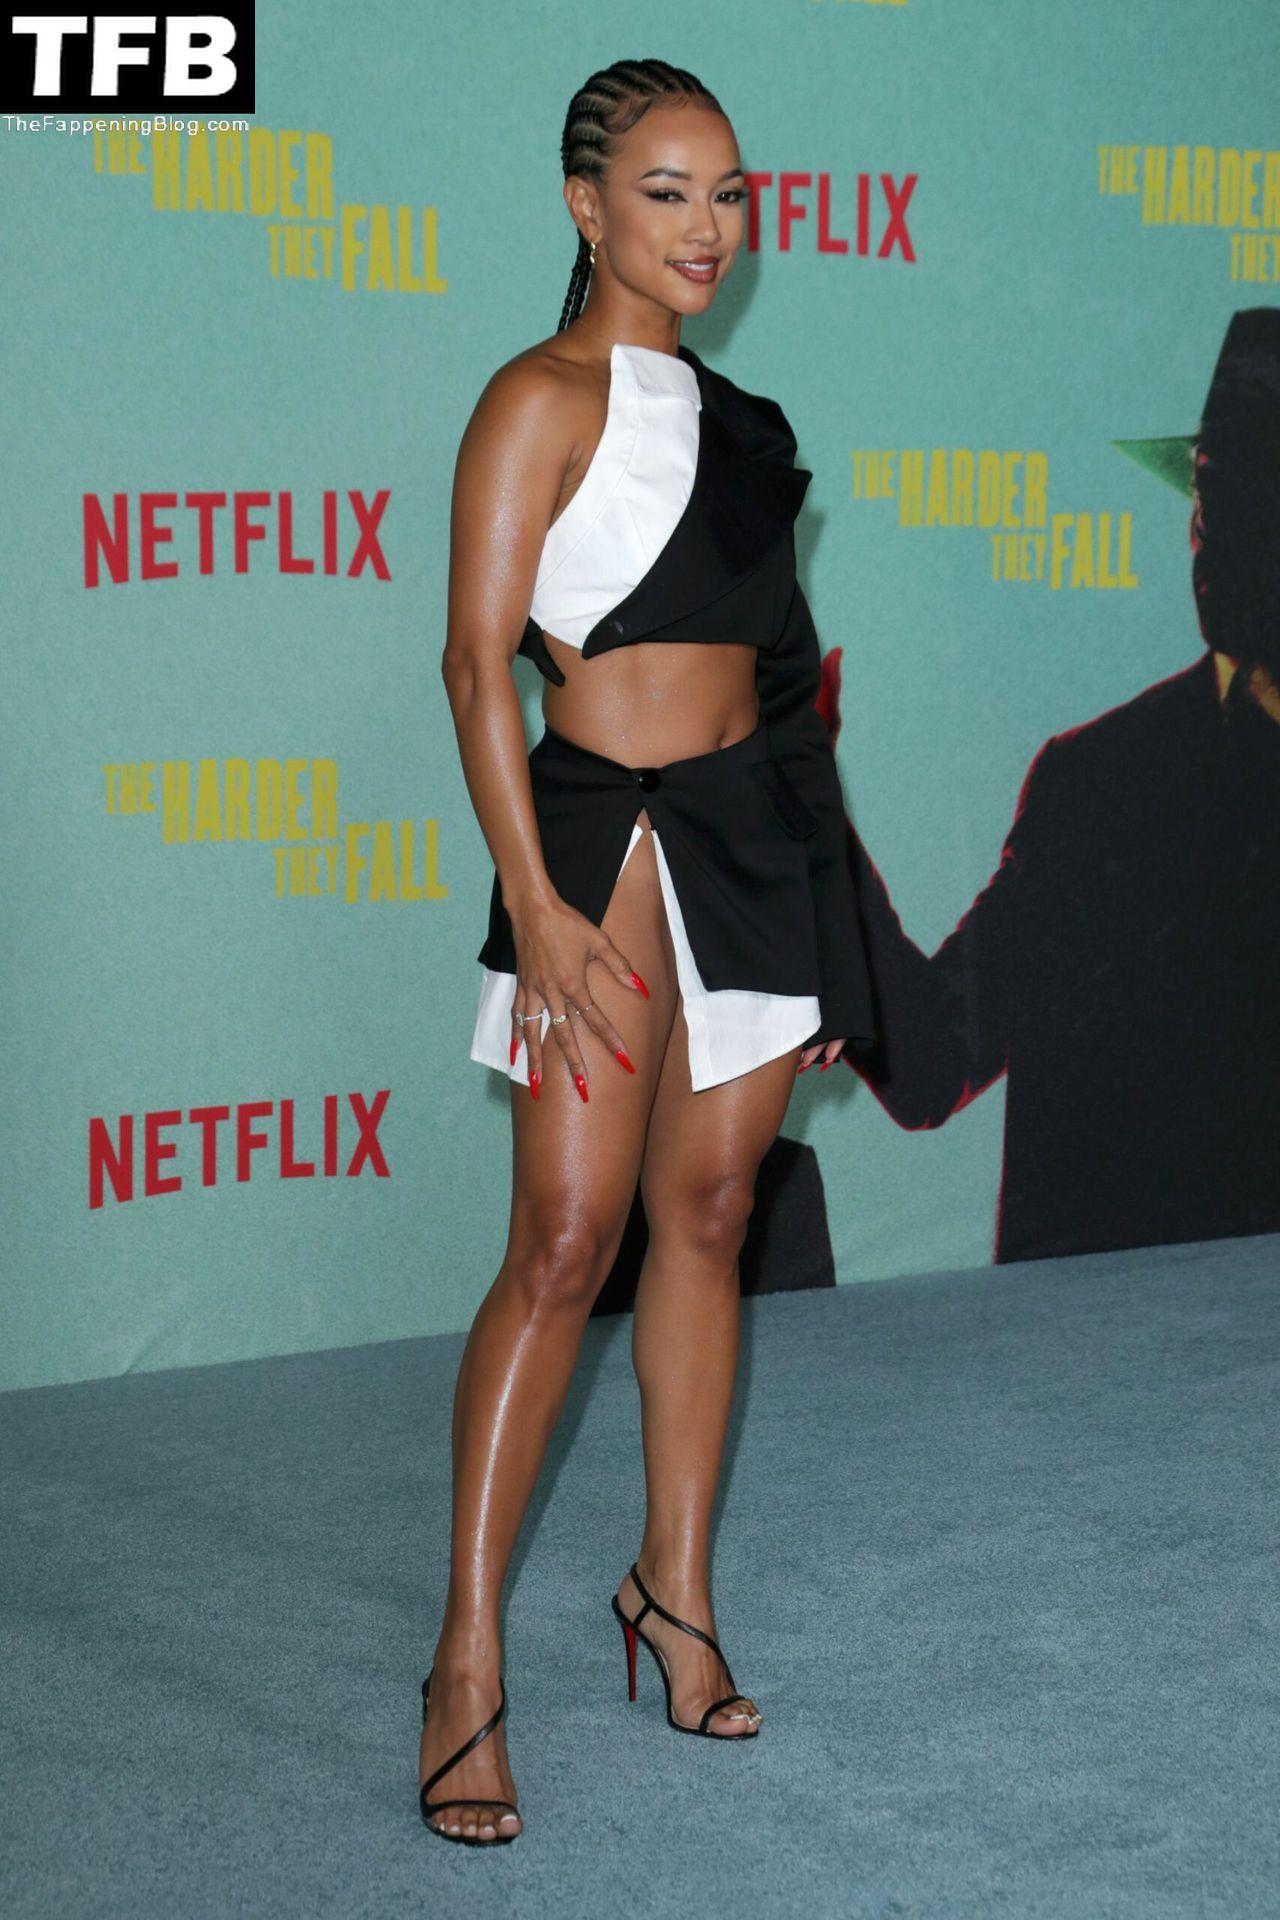 Karrueche-Tran-Sexy-Legs-Upskirt-The-Fappening-Blog-13.jpg